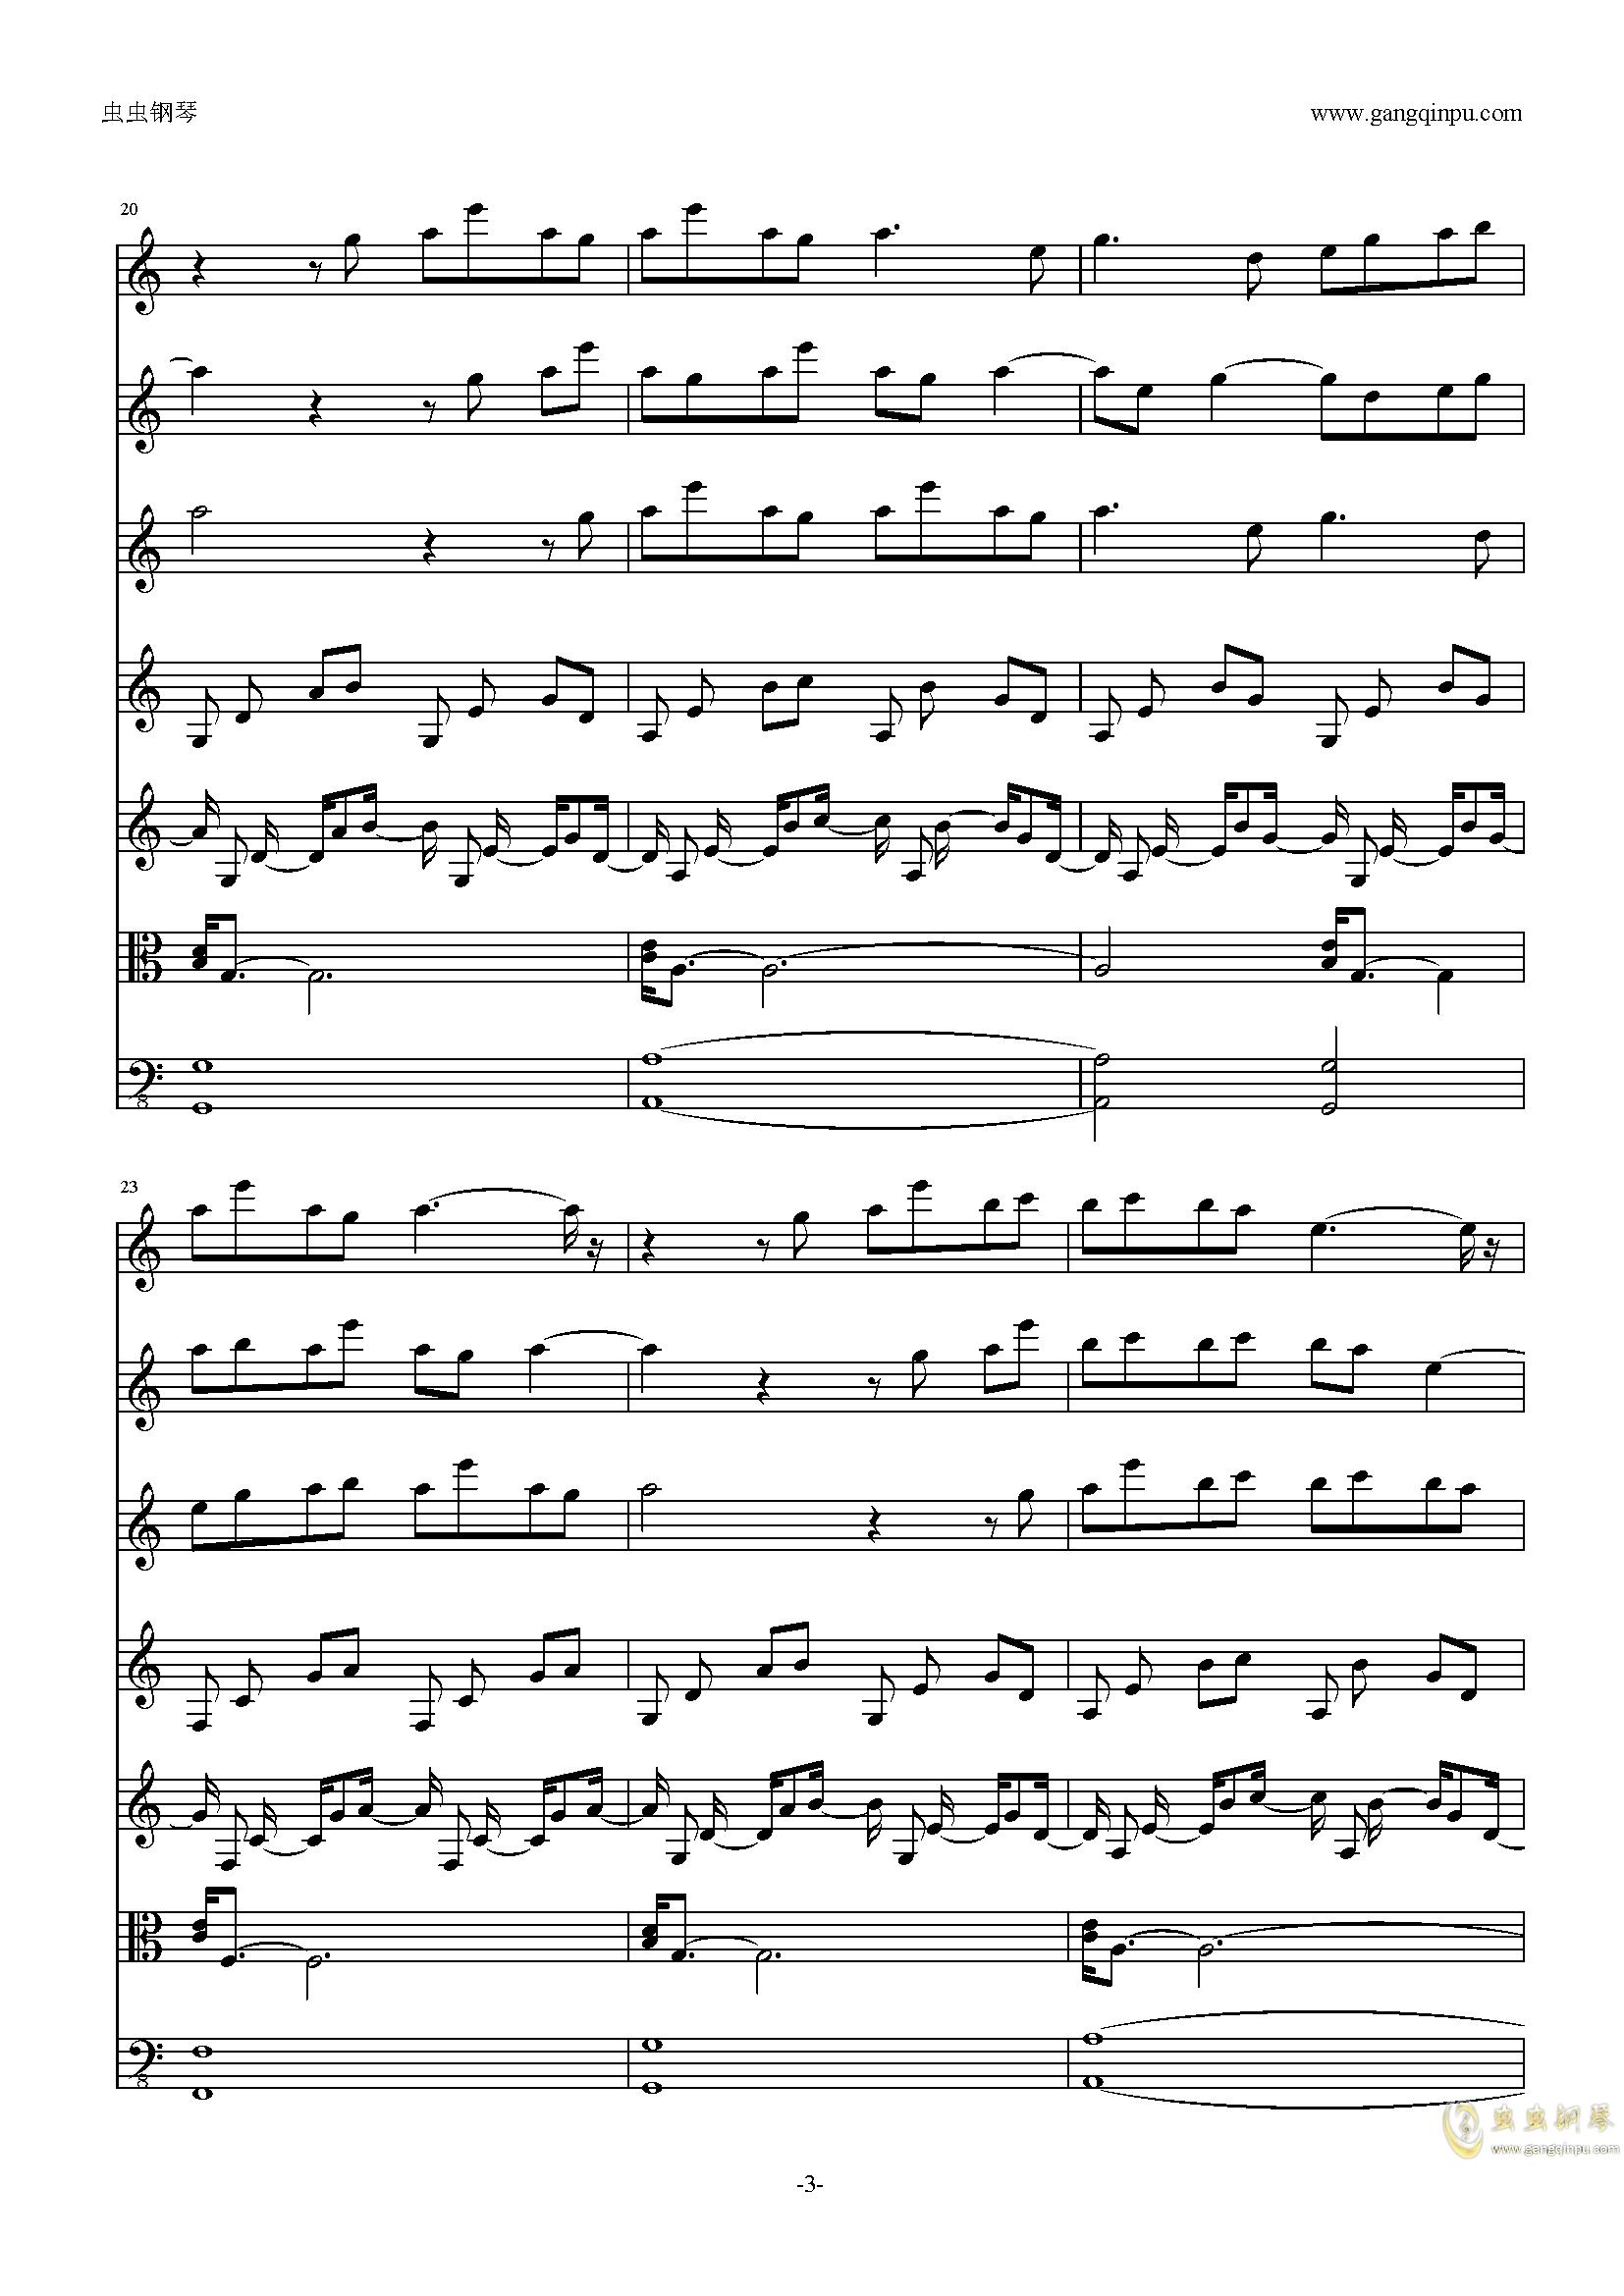 潮鸣り钢琴谱-clannad-虫虫钢琴谱免费下载